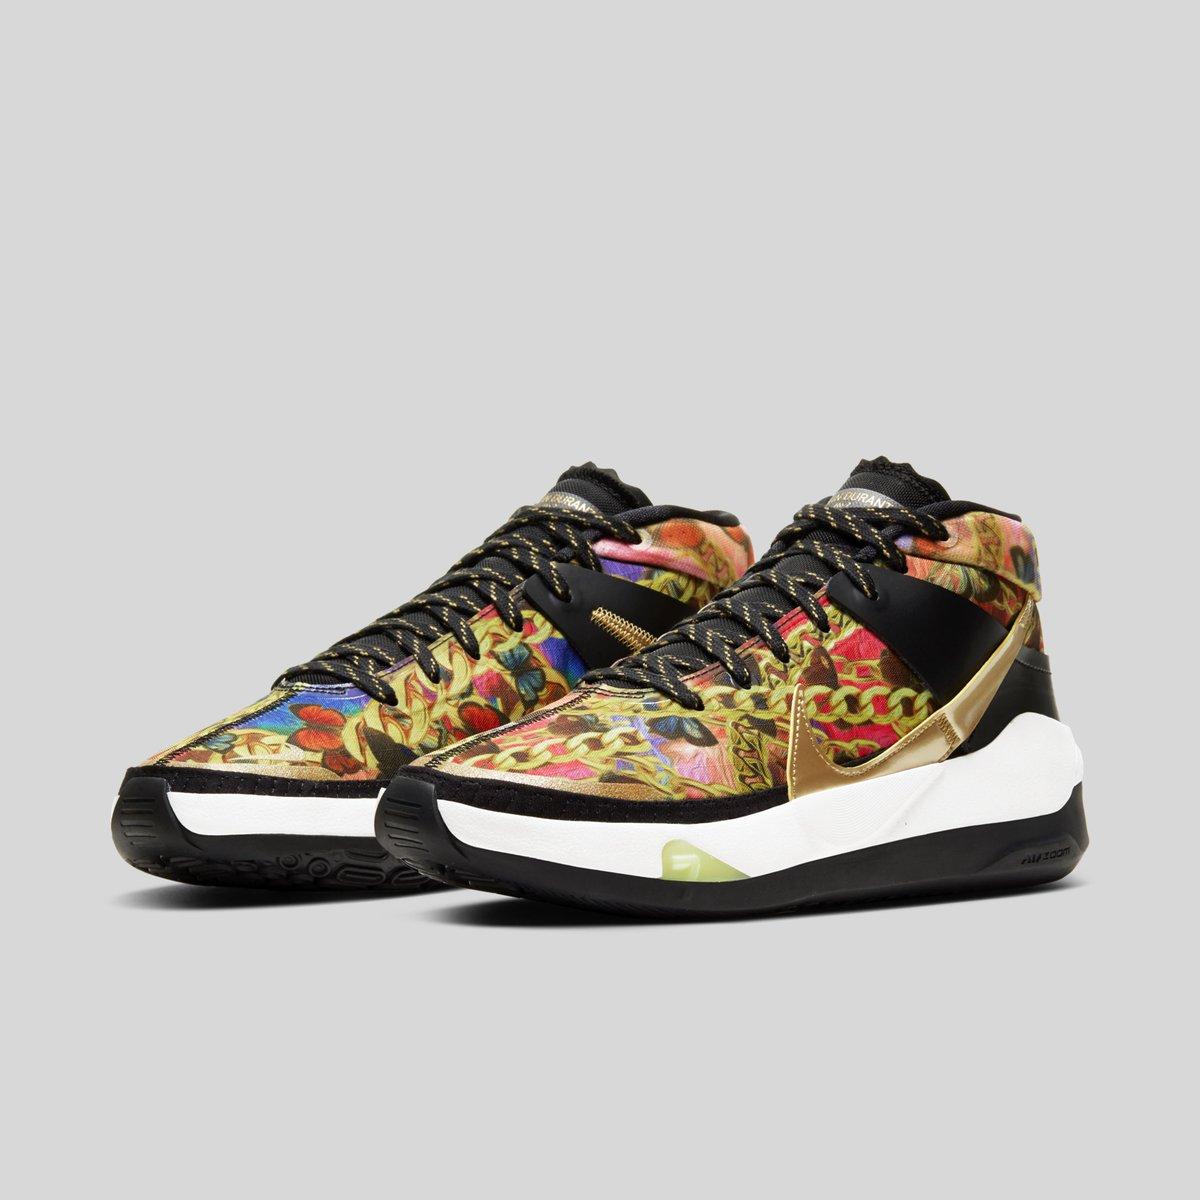 Nike Basketball KD13